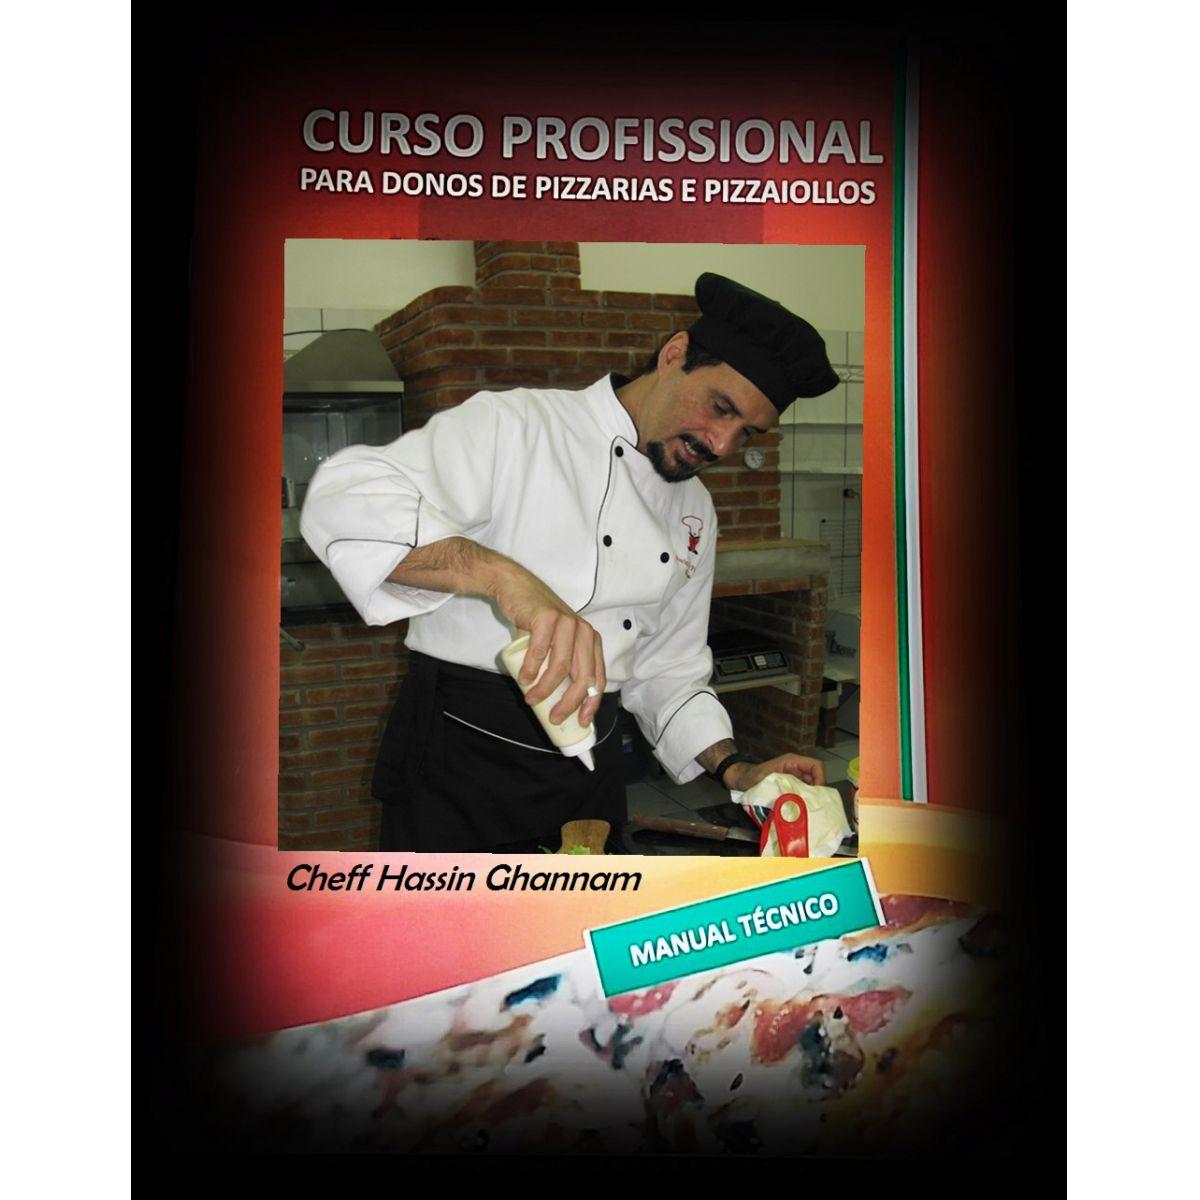 TRILOGIA DOS DVDS VOLUMES I, II, III POR PAC  - Fórum de Pizzas Vendas online